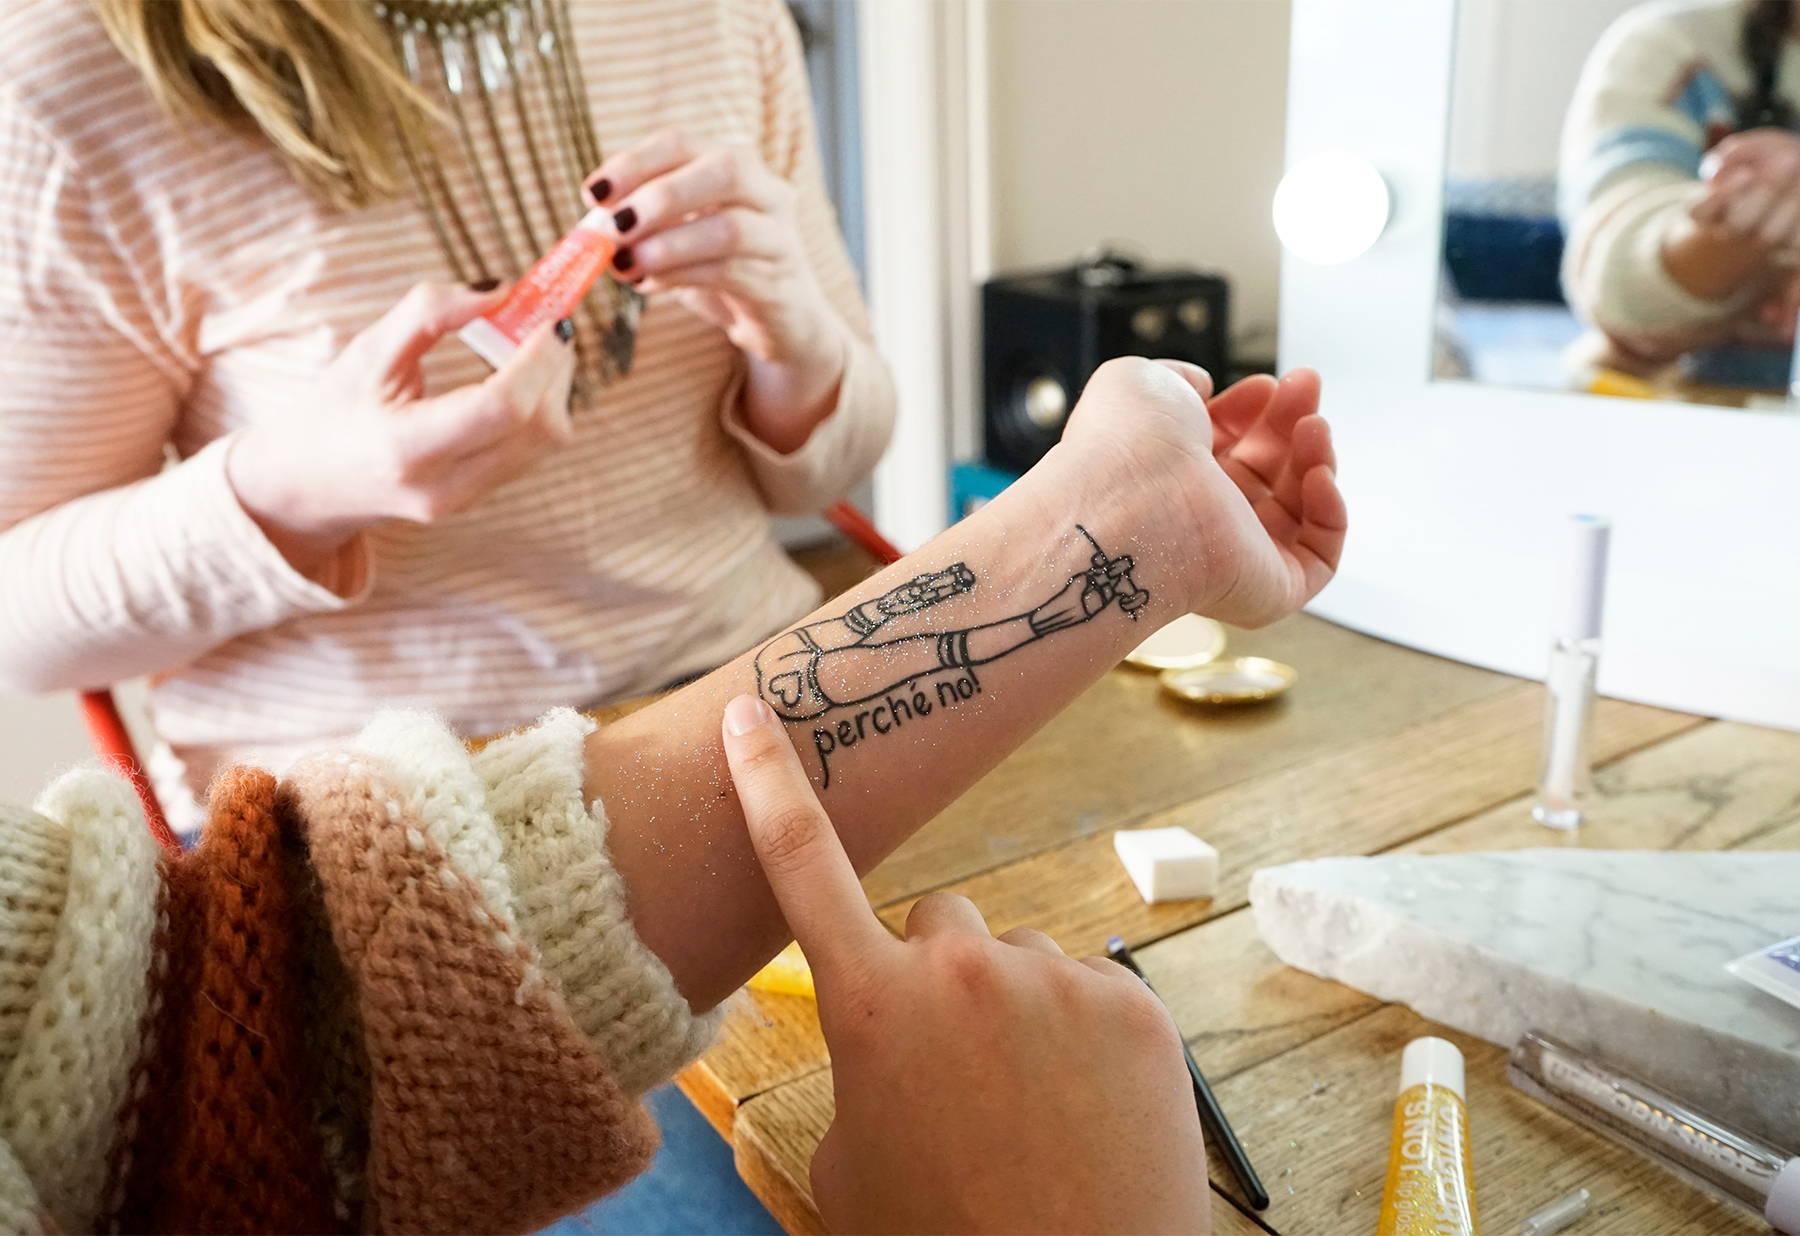 Amanda puts silver Unicorn Snot glitter gel on her tattoo.